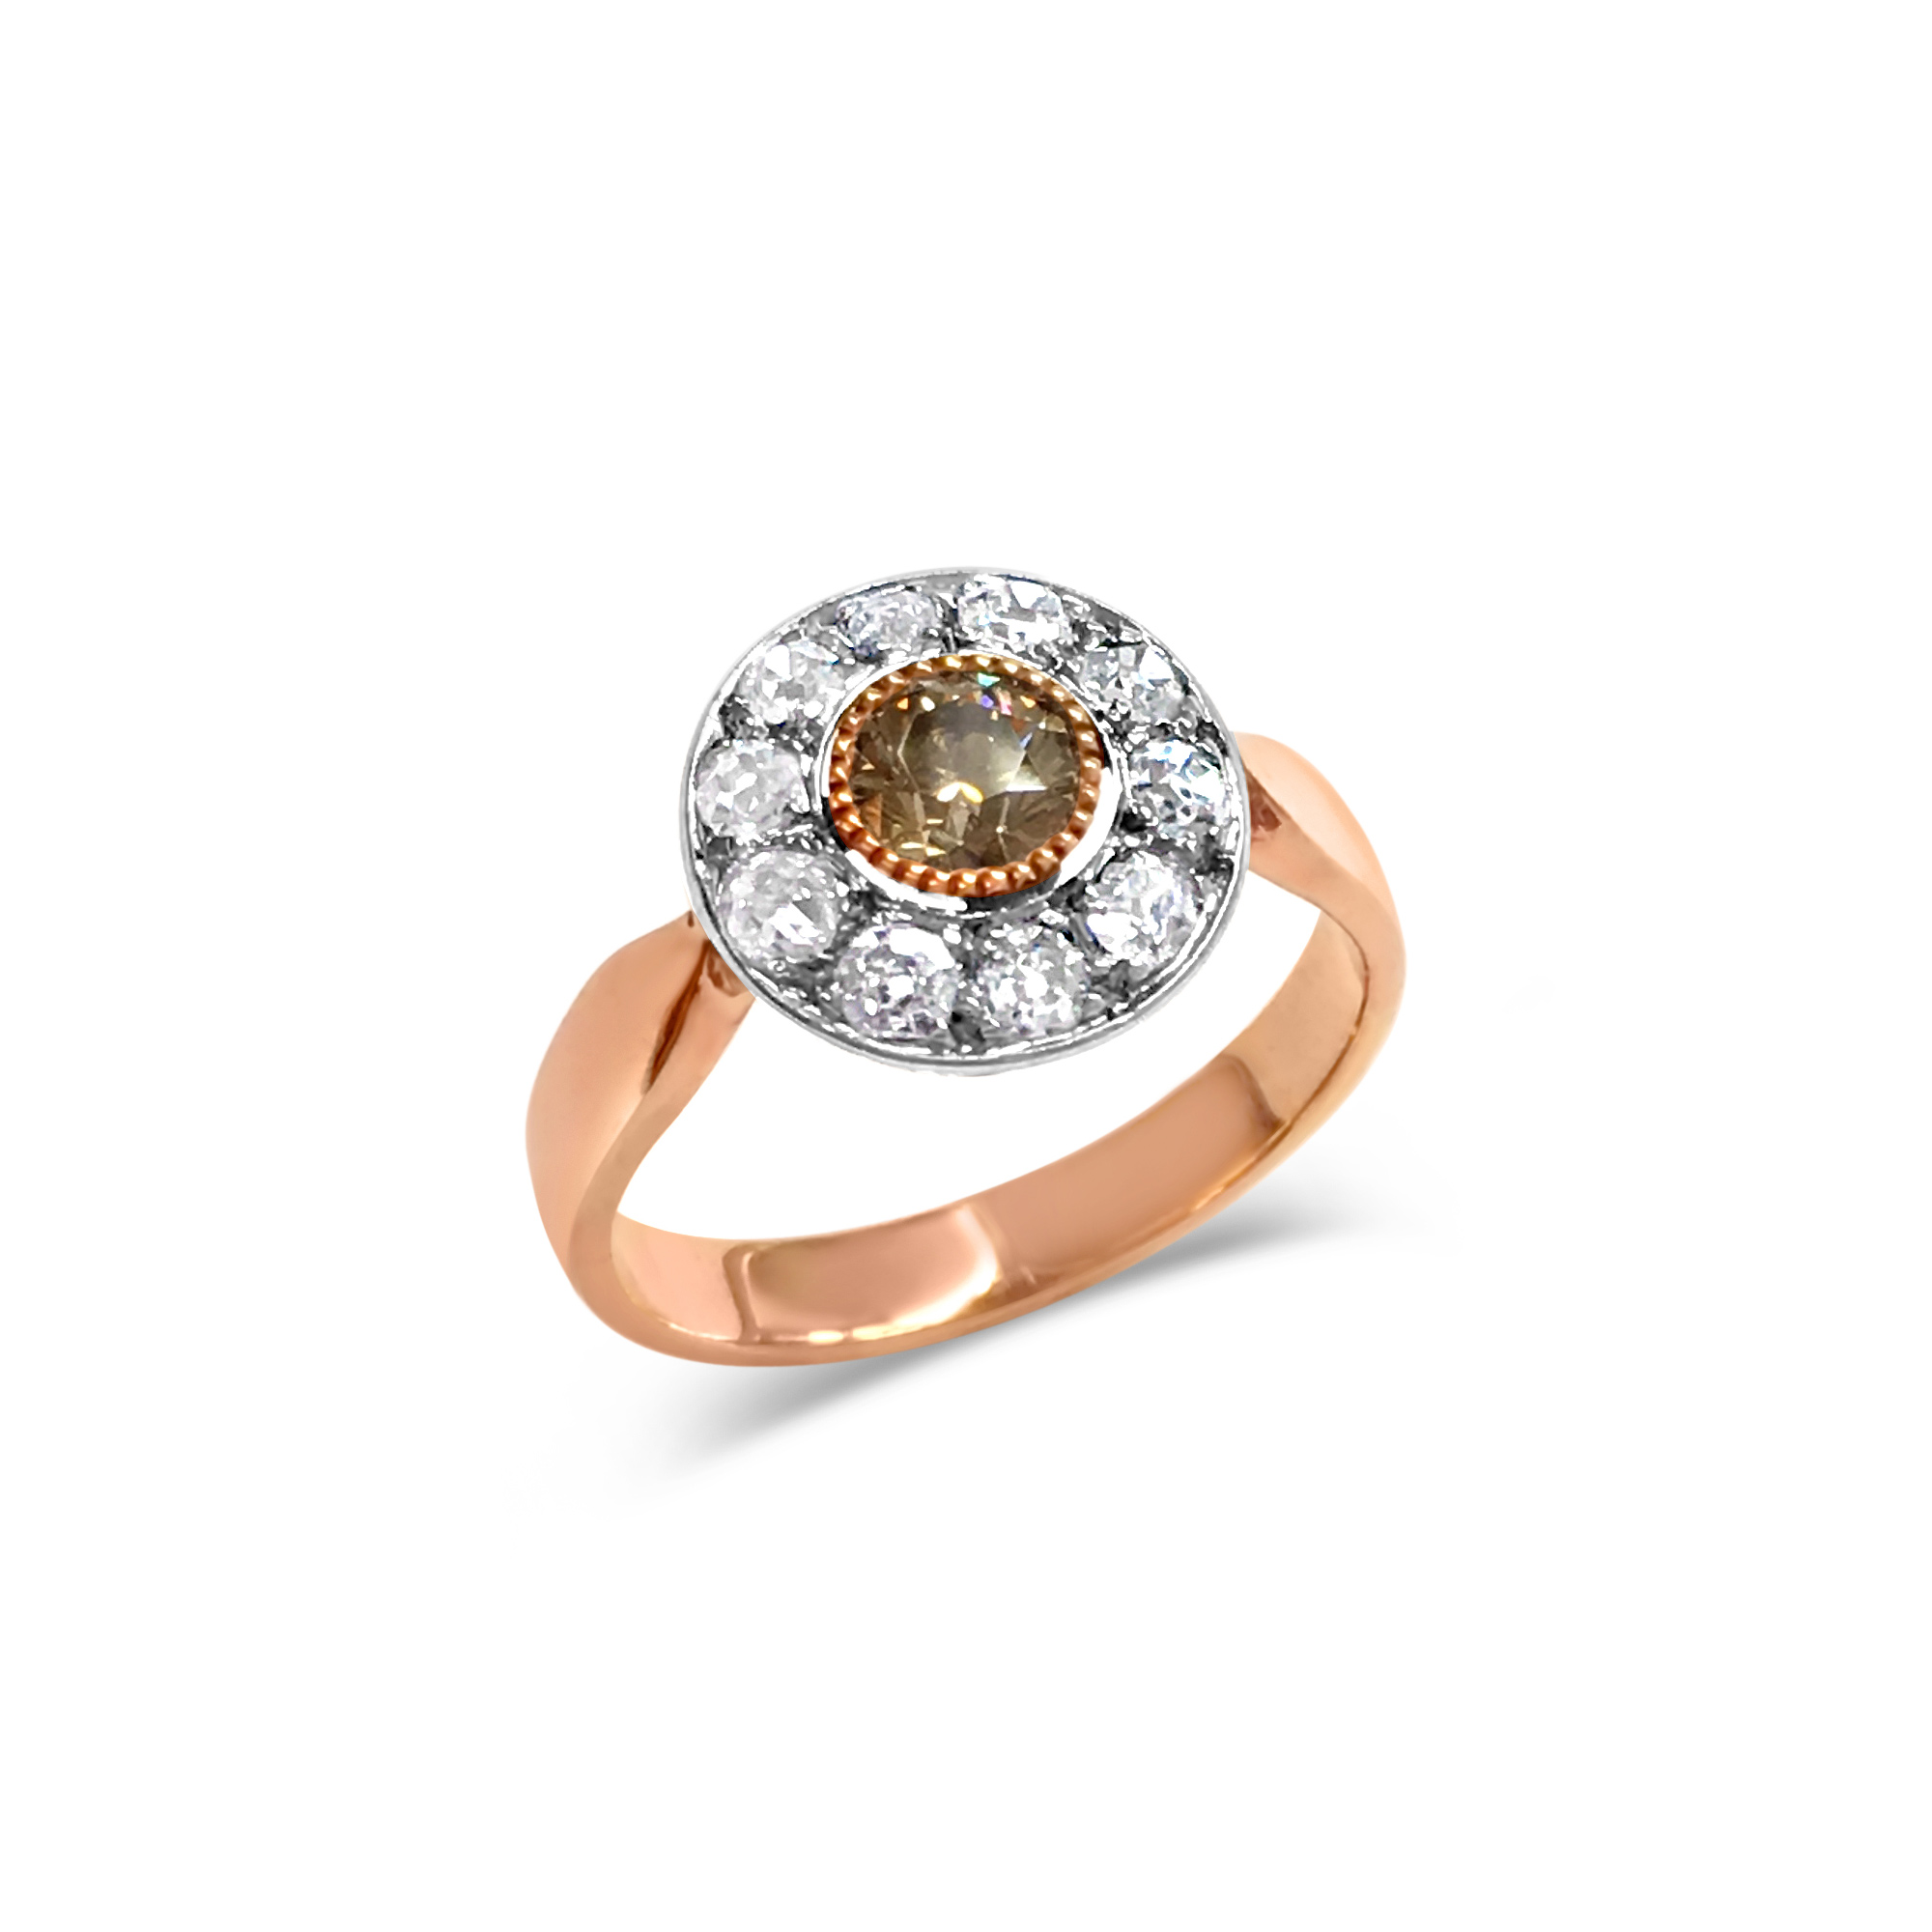 Antique Rose Gold Diamond Cluster Ring